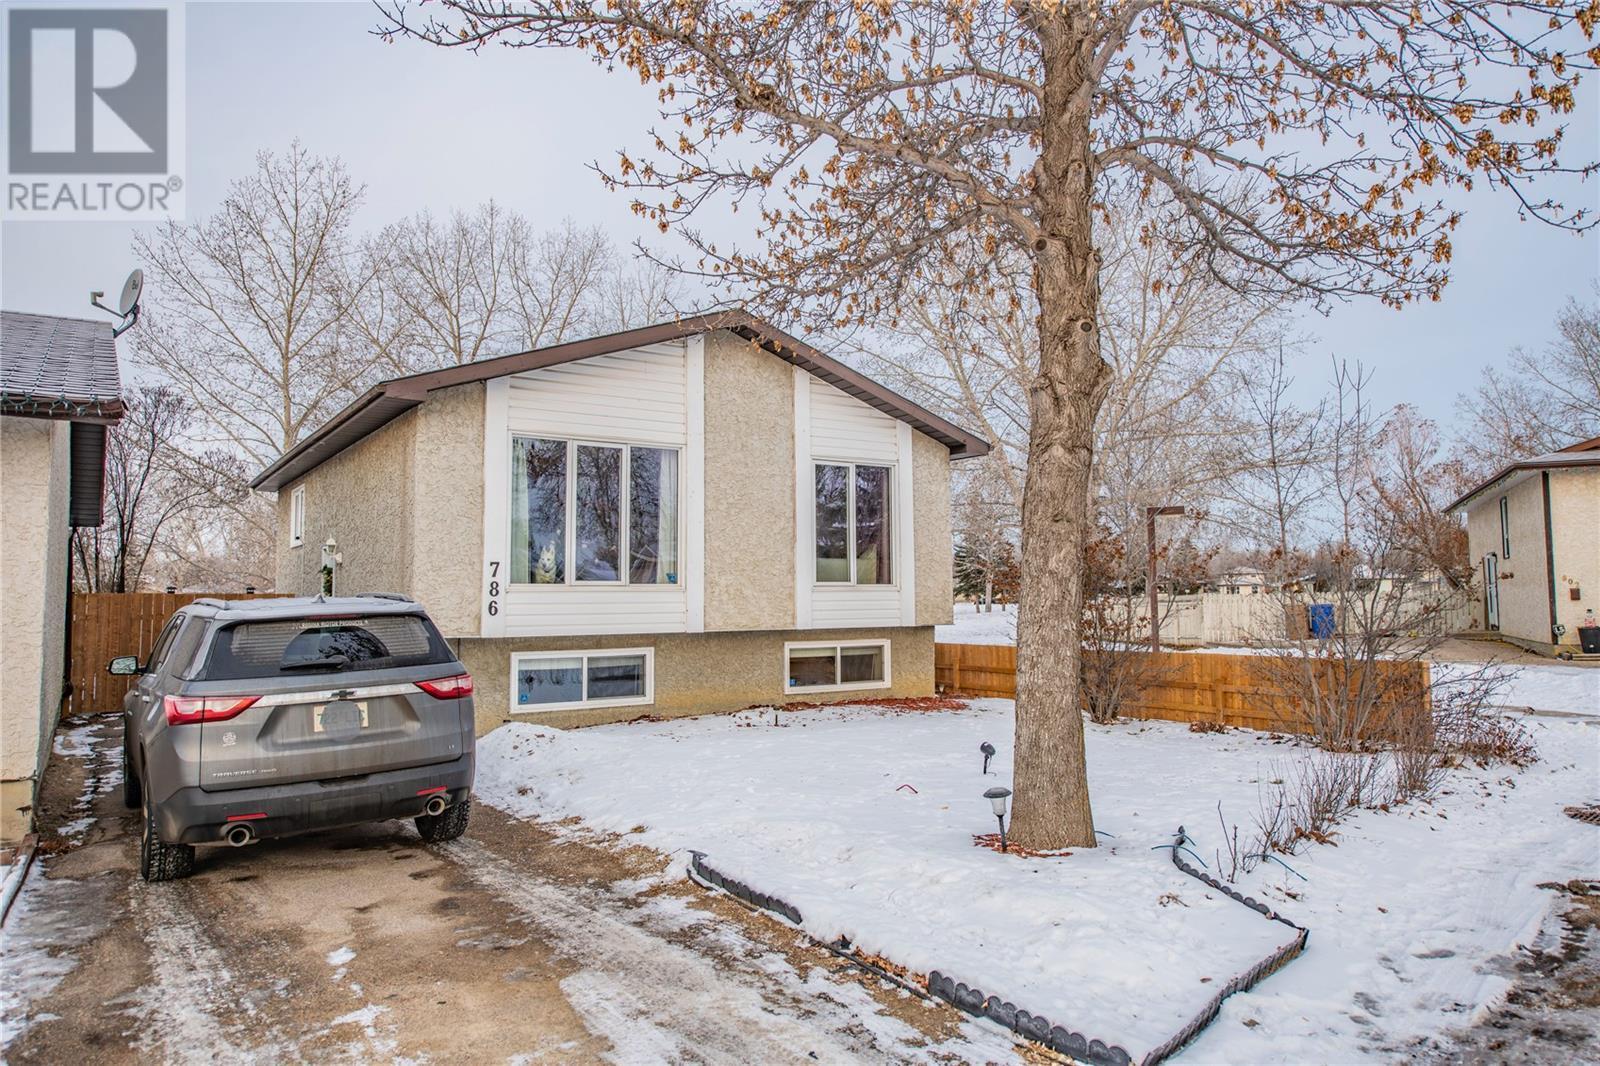 Removed: 786 Hayworth Crescent North, Regina, SK - Removed on 2020-01-17 04:21:12